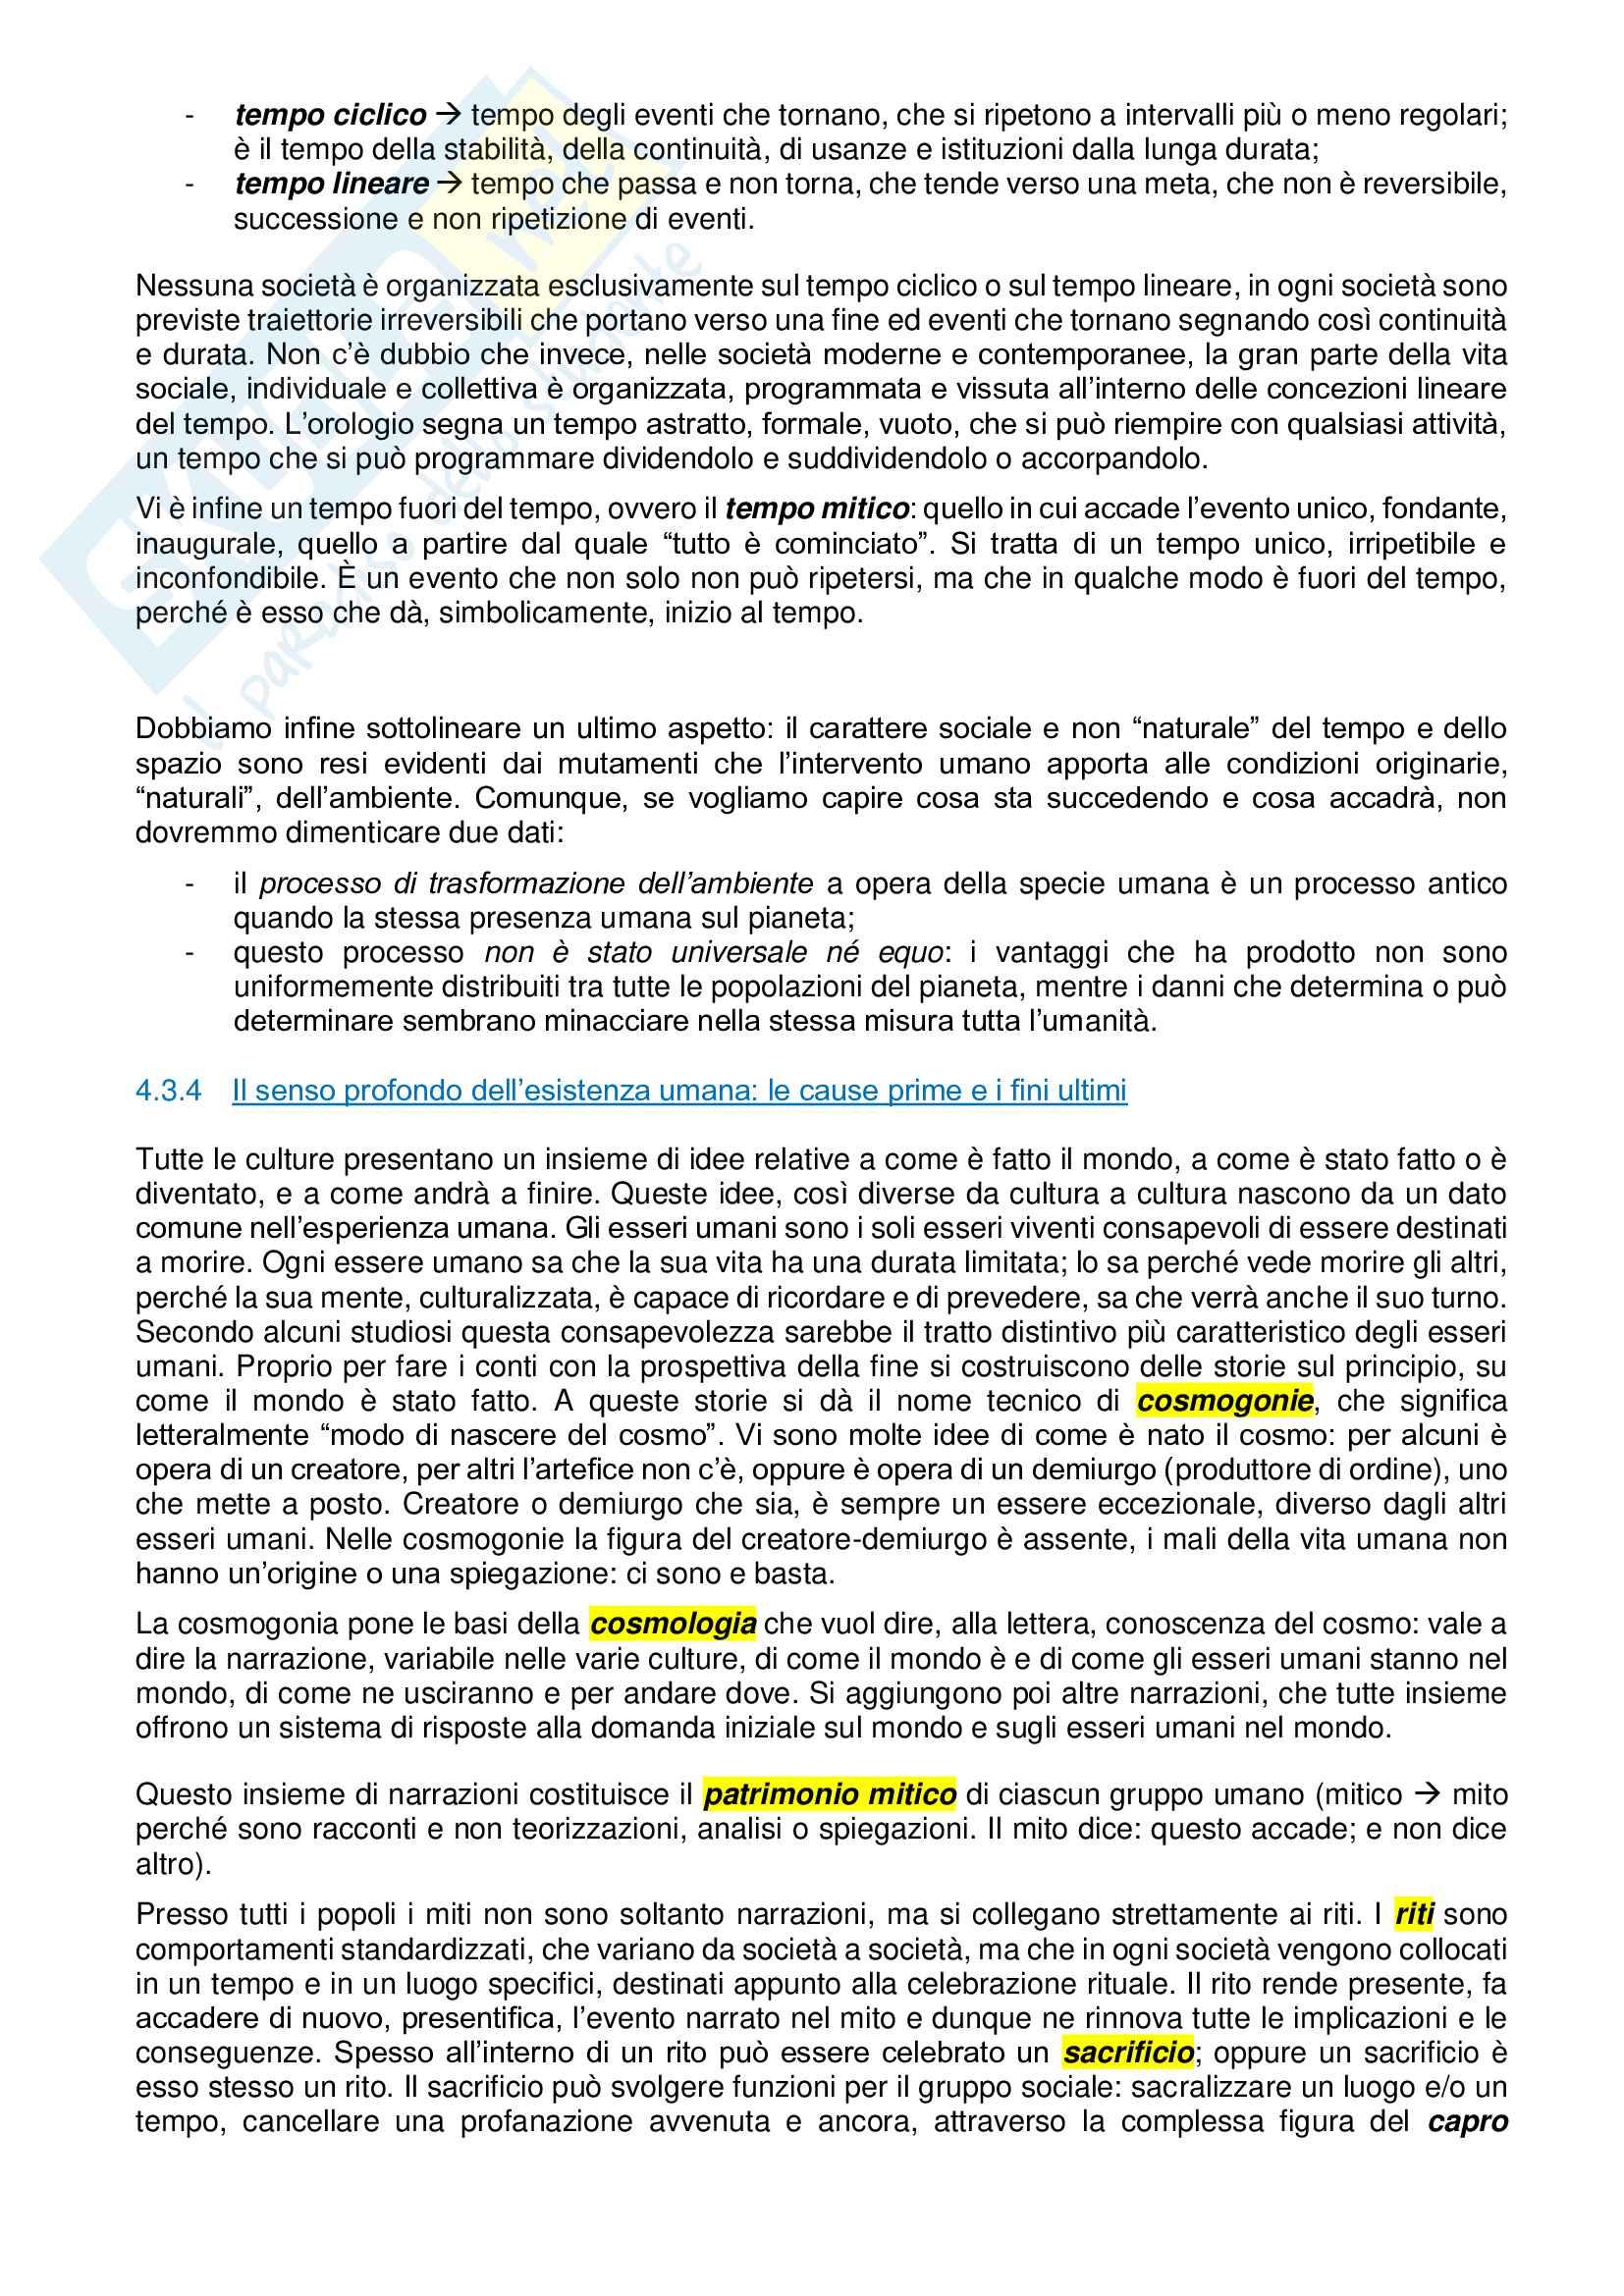 Riassunto esame Antropologia culturale, lineamenti essenziali Pag. 26